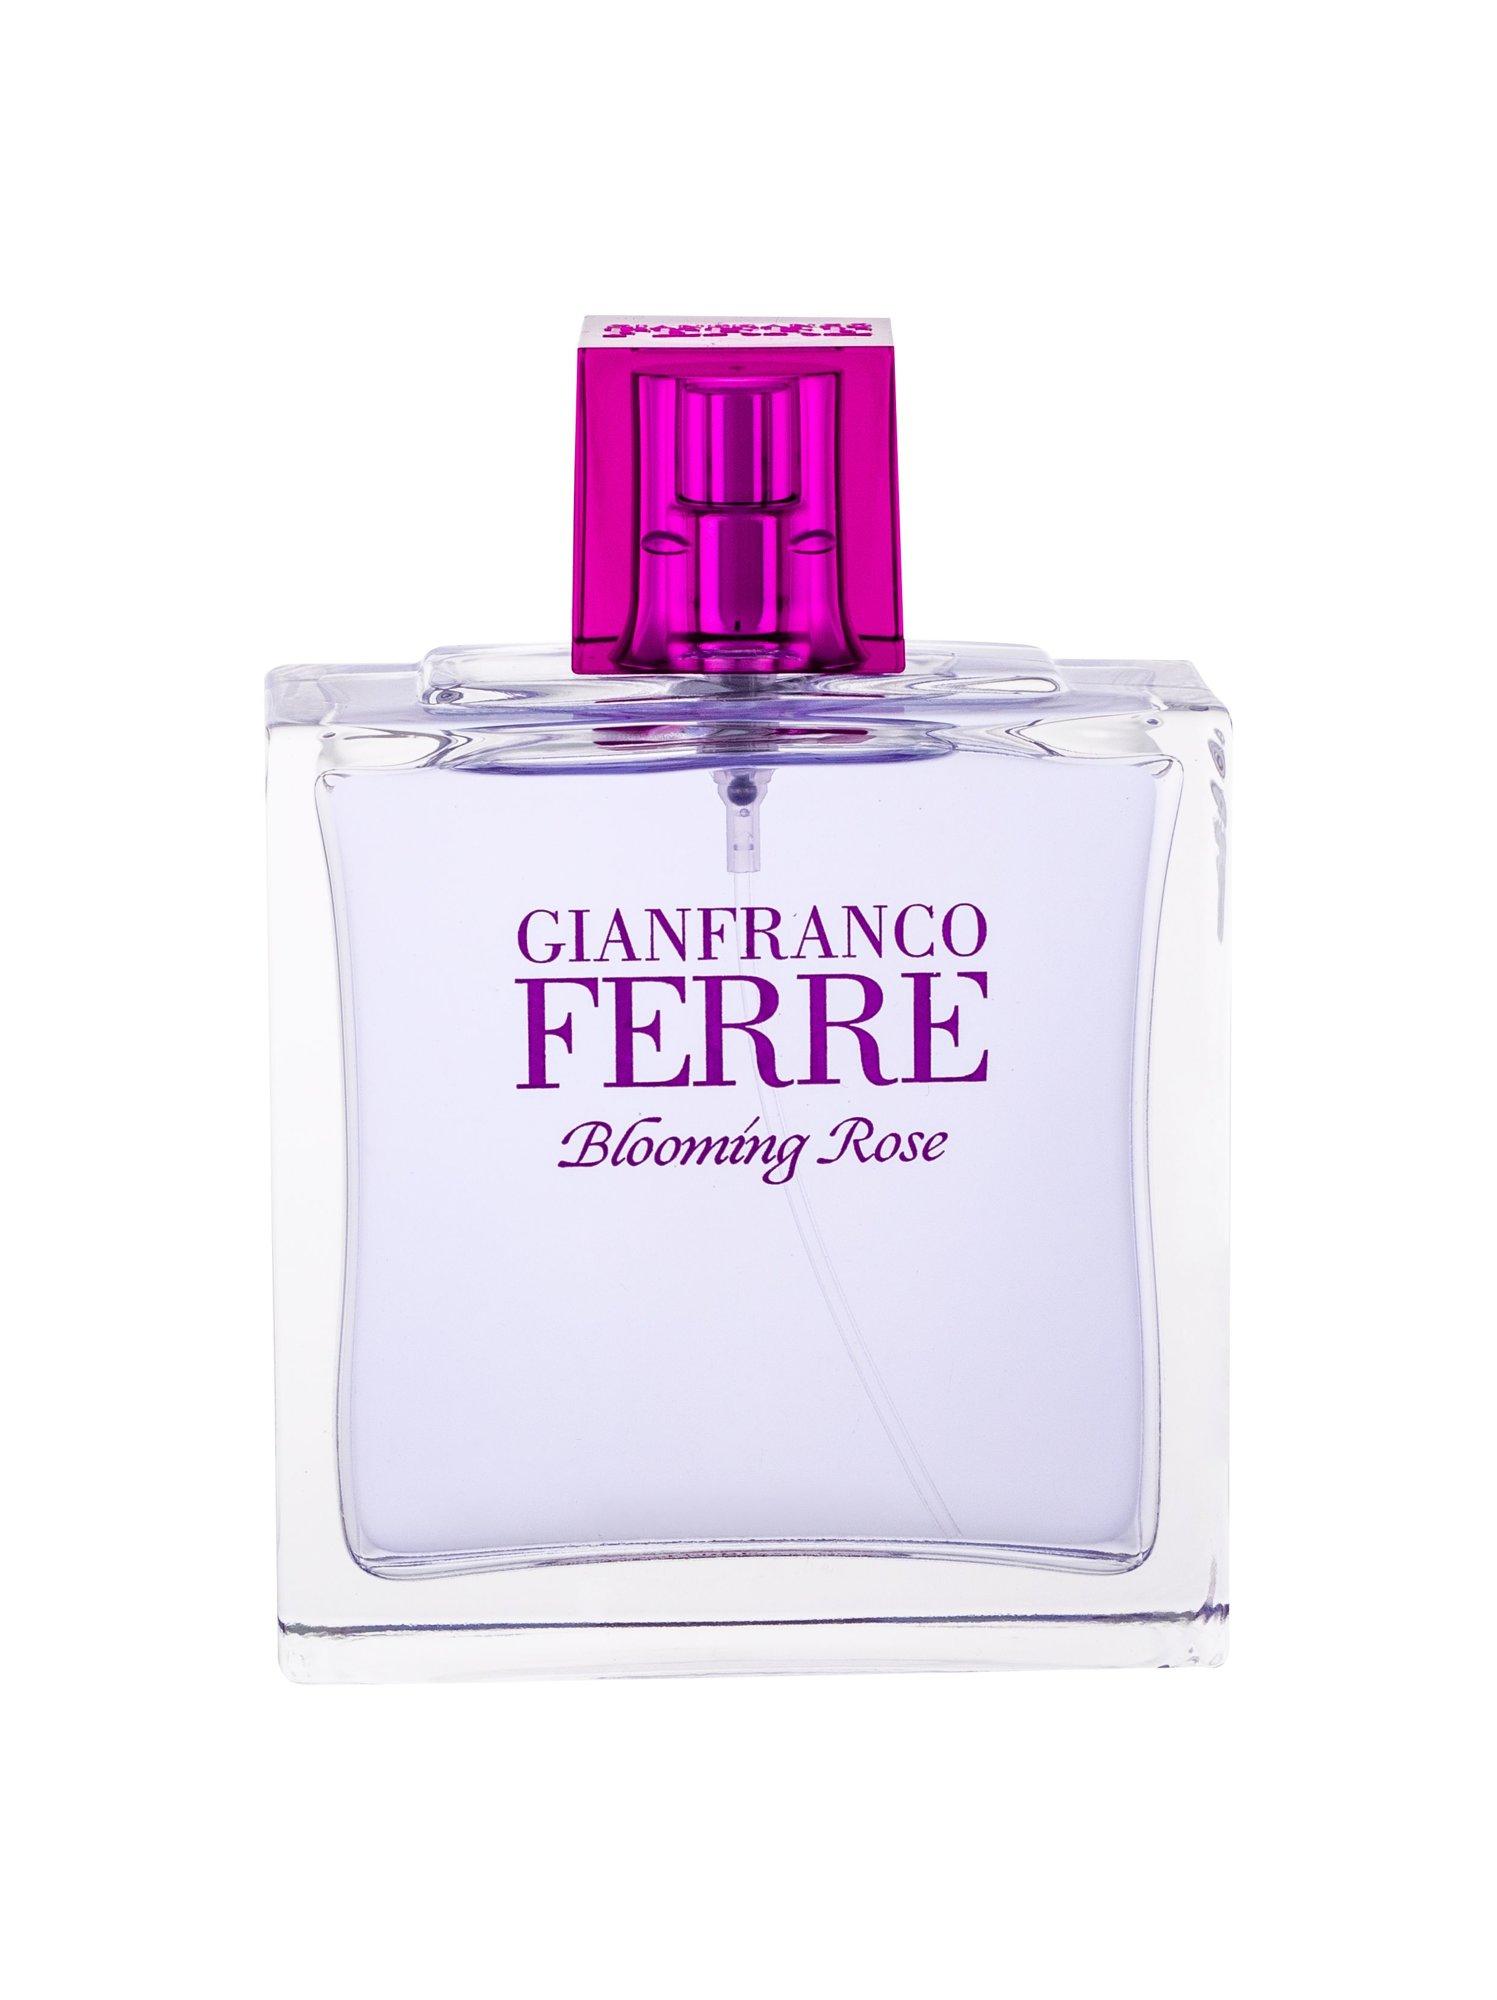 Gianfranco Ferré Blooming Rose Eau de Toilette 100ml